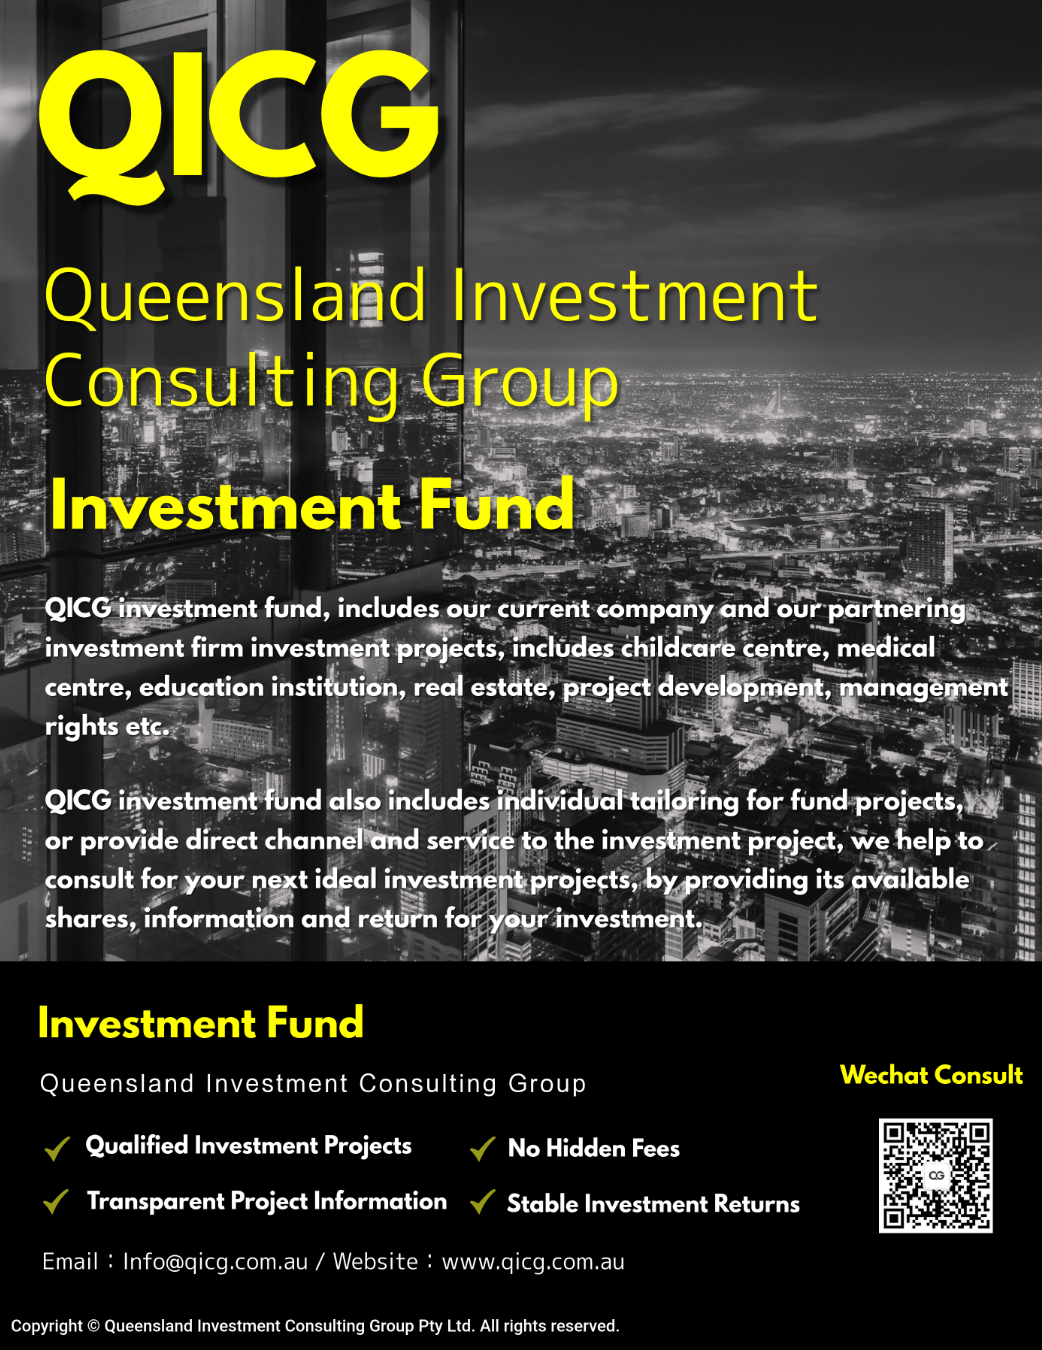 QICG Capital